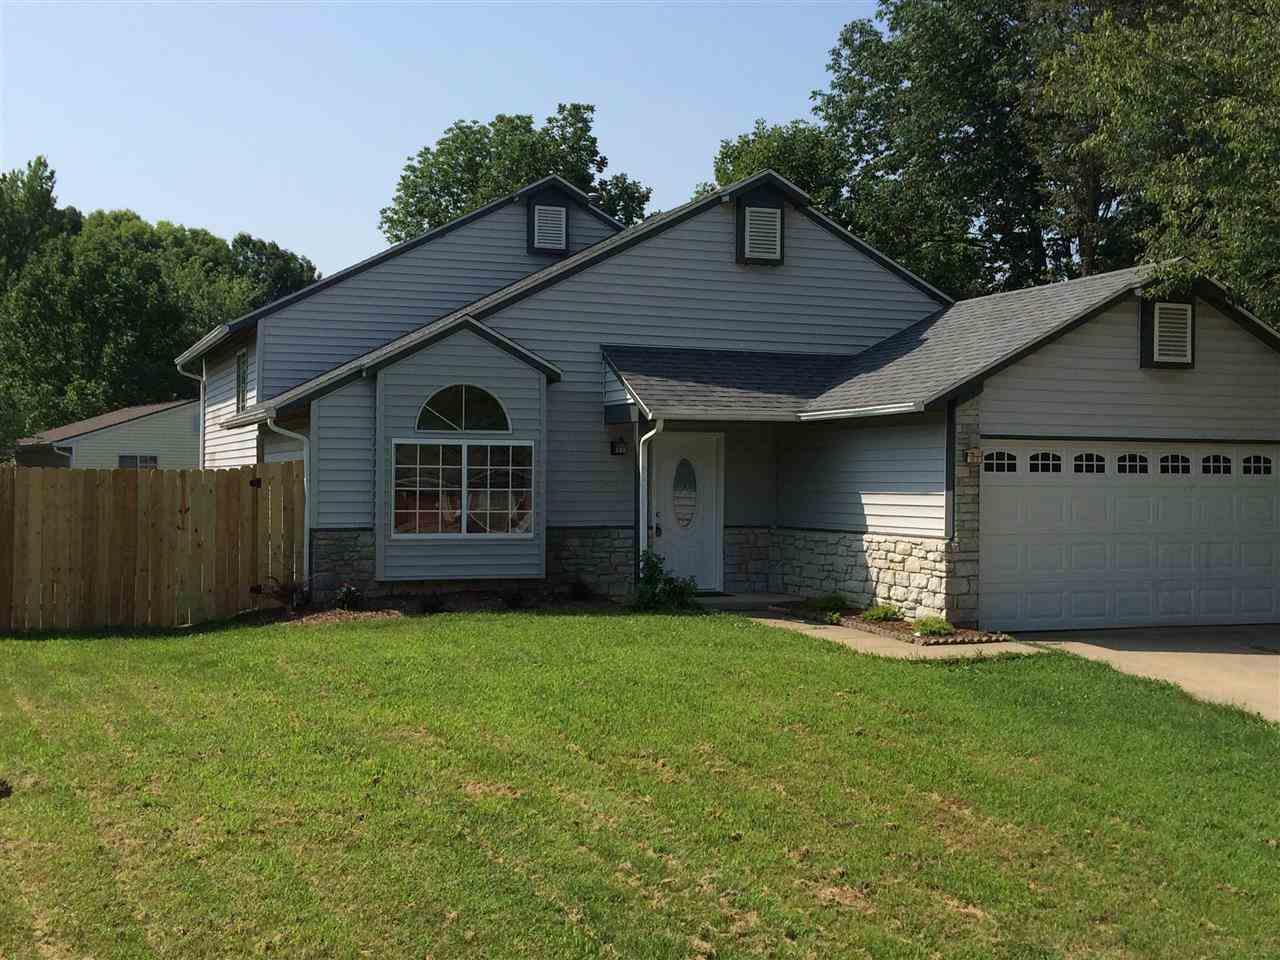 Real Estate for Sale, ListingId: 30174400, Bloomington,IN47403